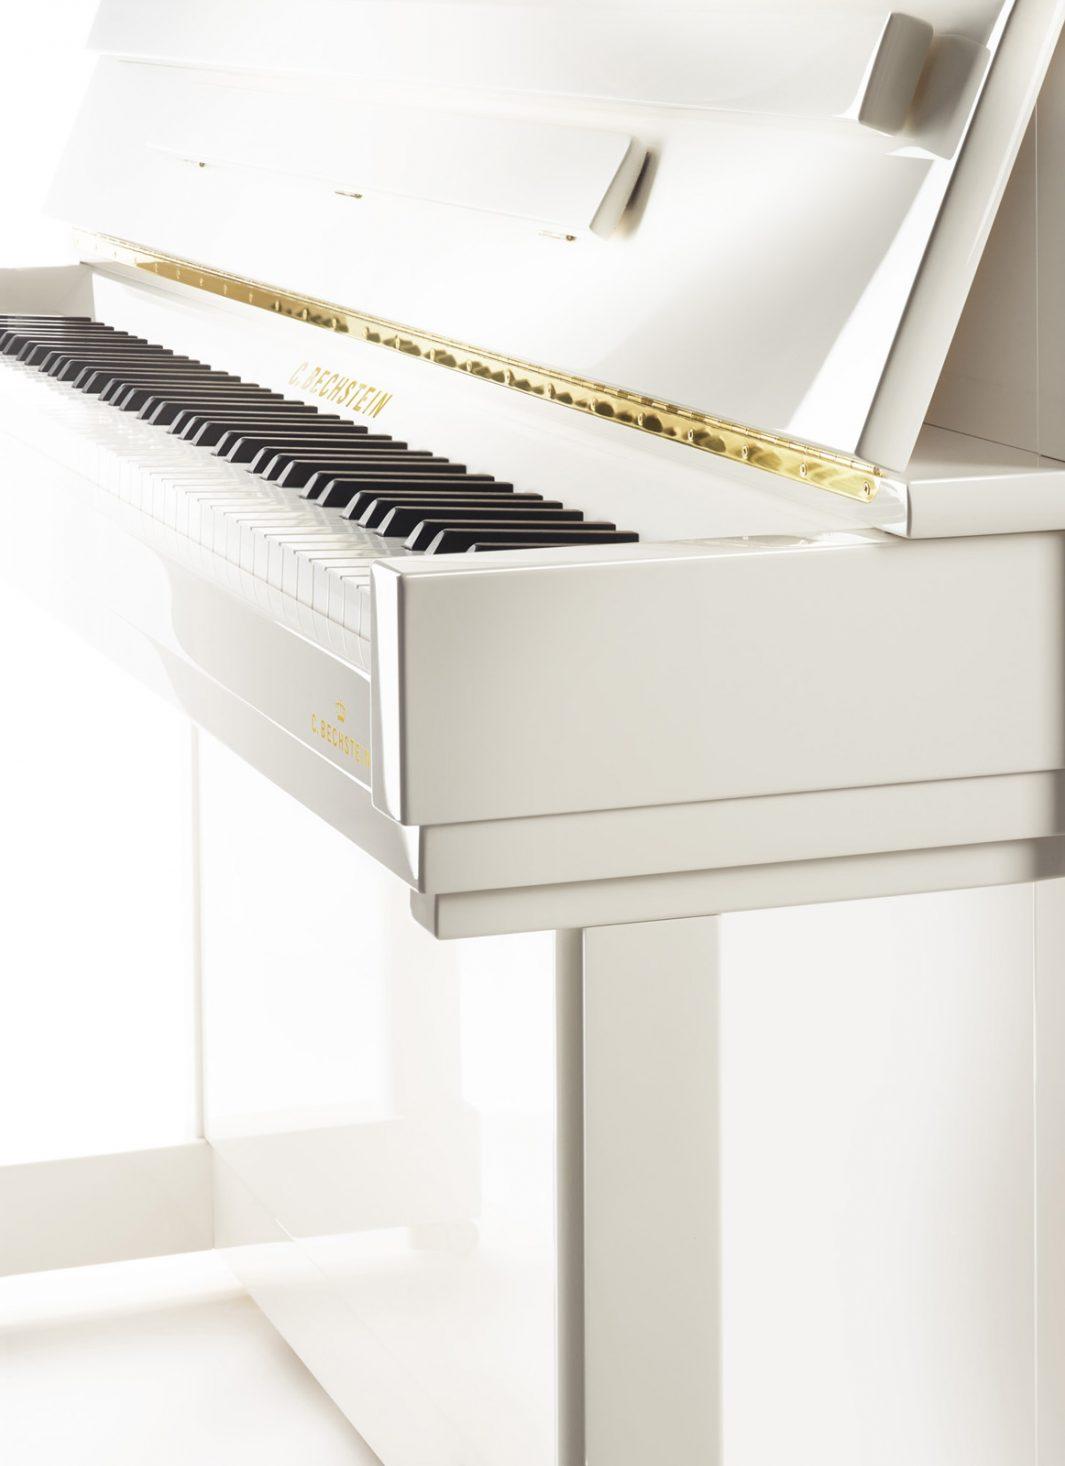 fokuspunkt c bechstein klavier fokuspunkt. Black Bedroom Furniture Sets. Home Design Ideas